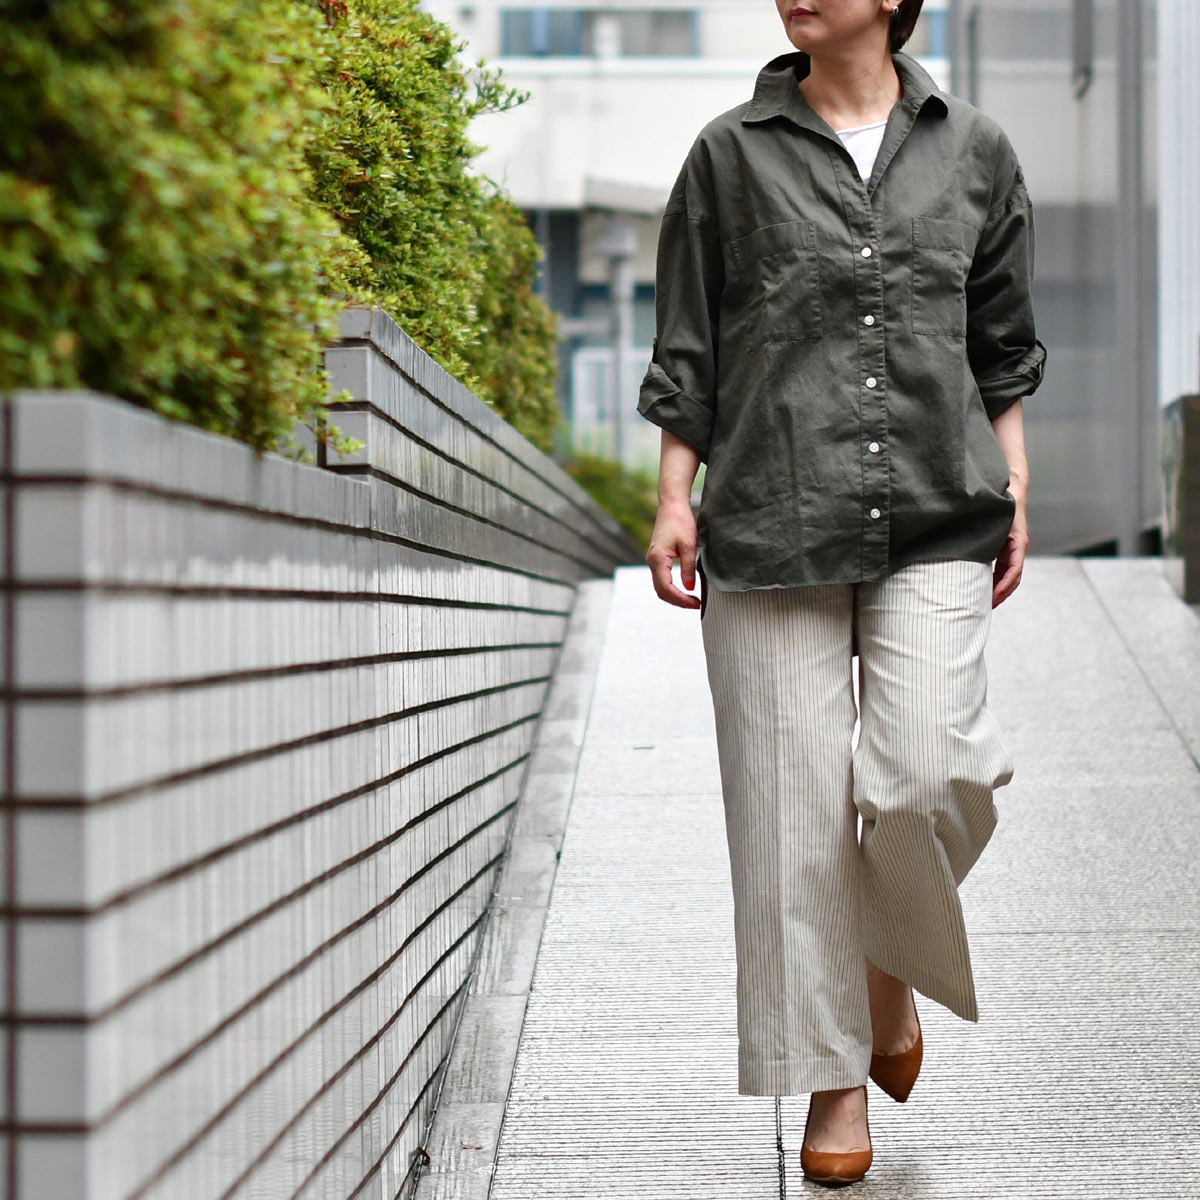 Finamore【フィナモレ】ロールアップビッグシルエットシャツ